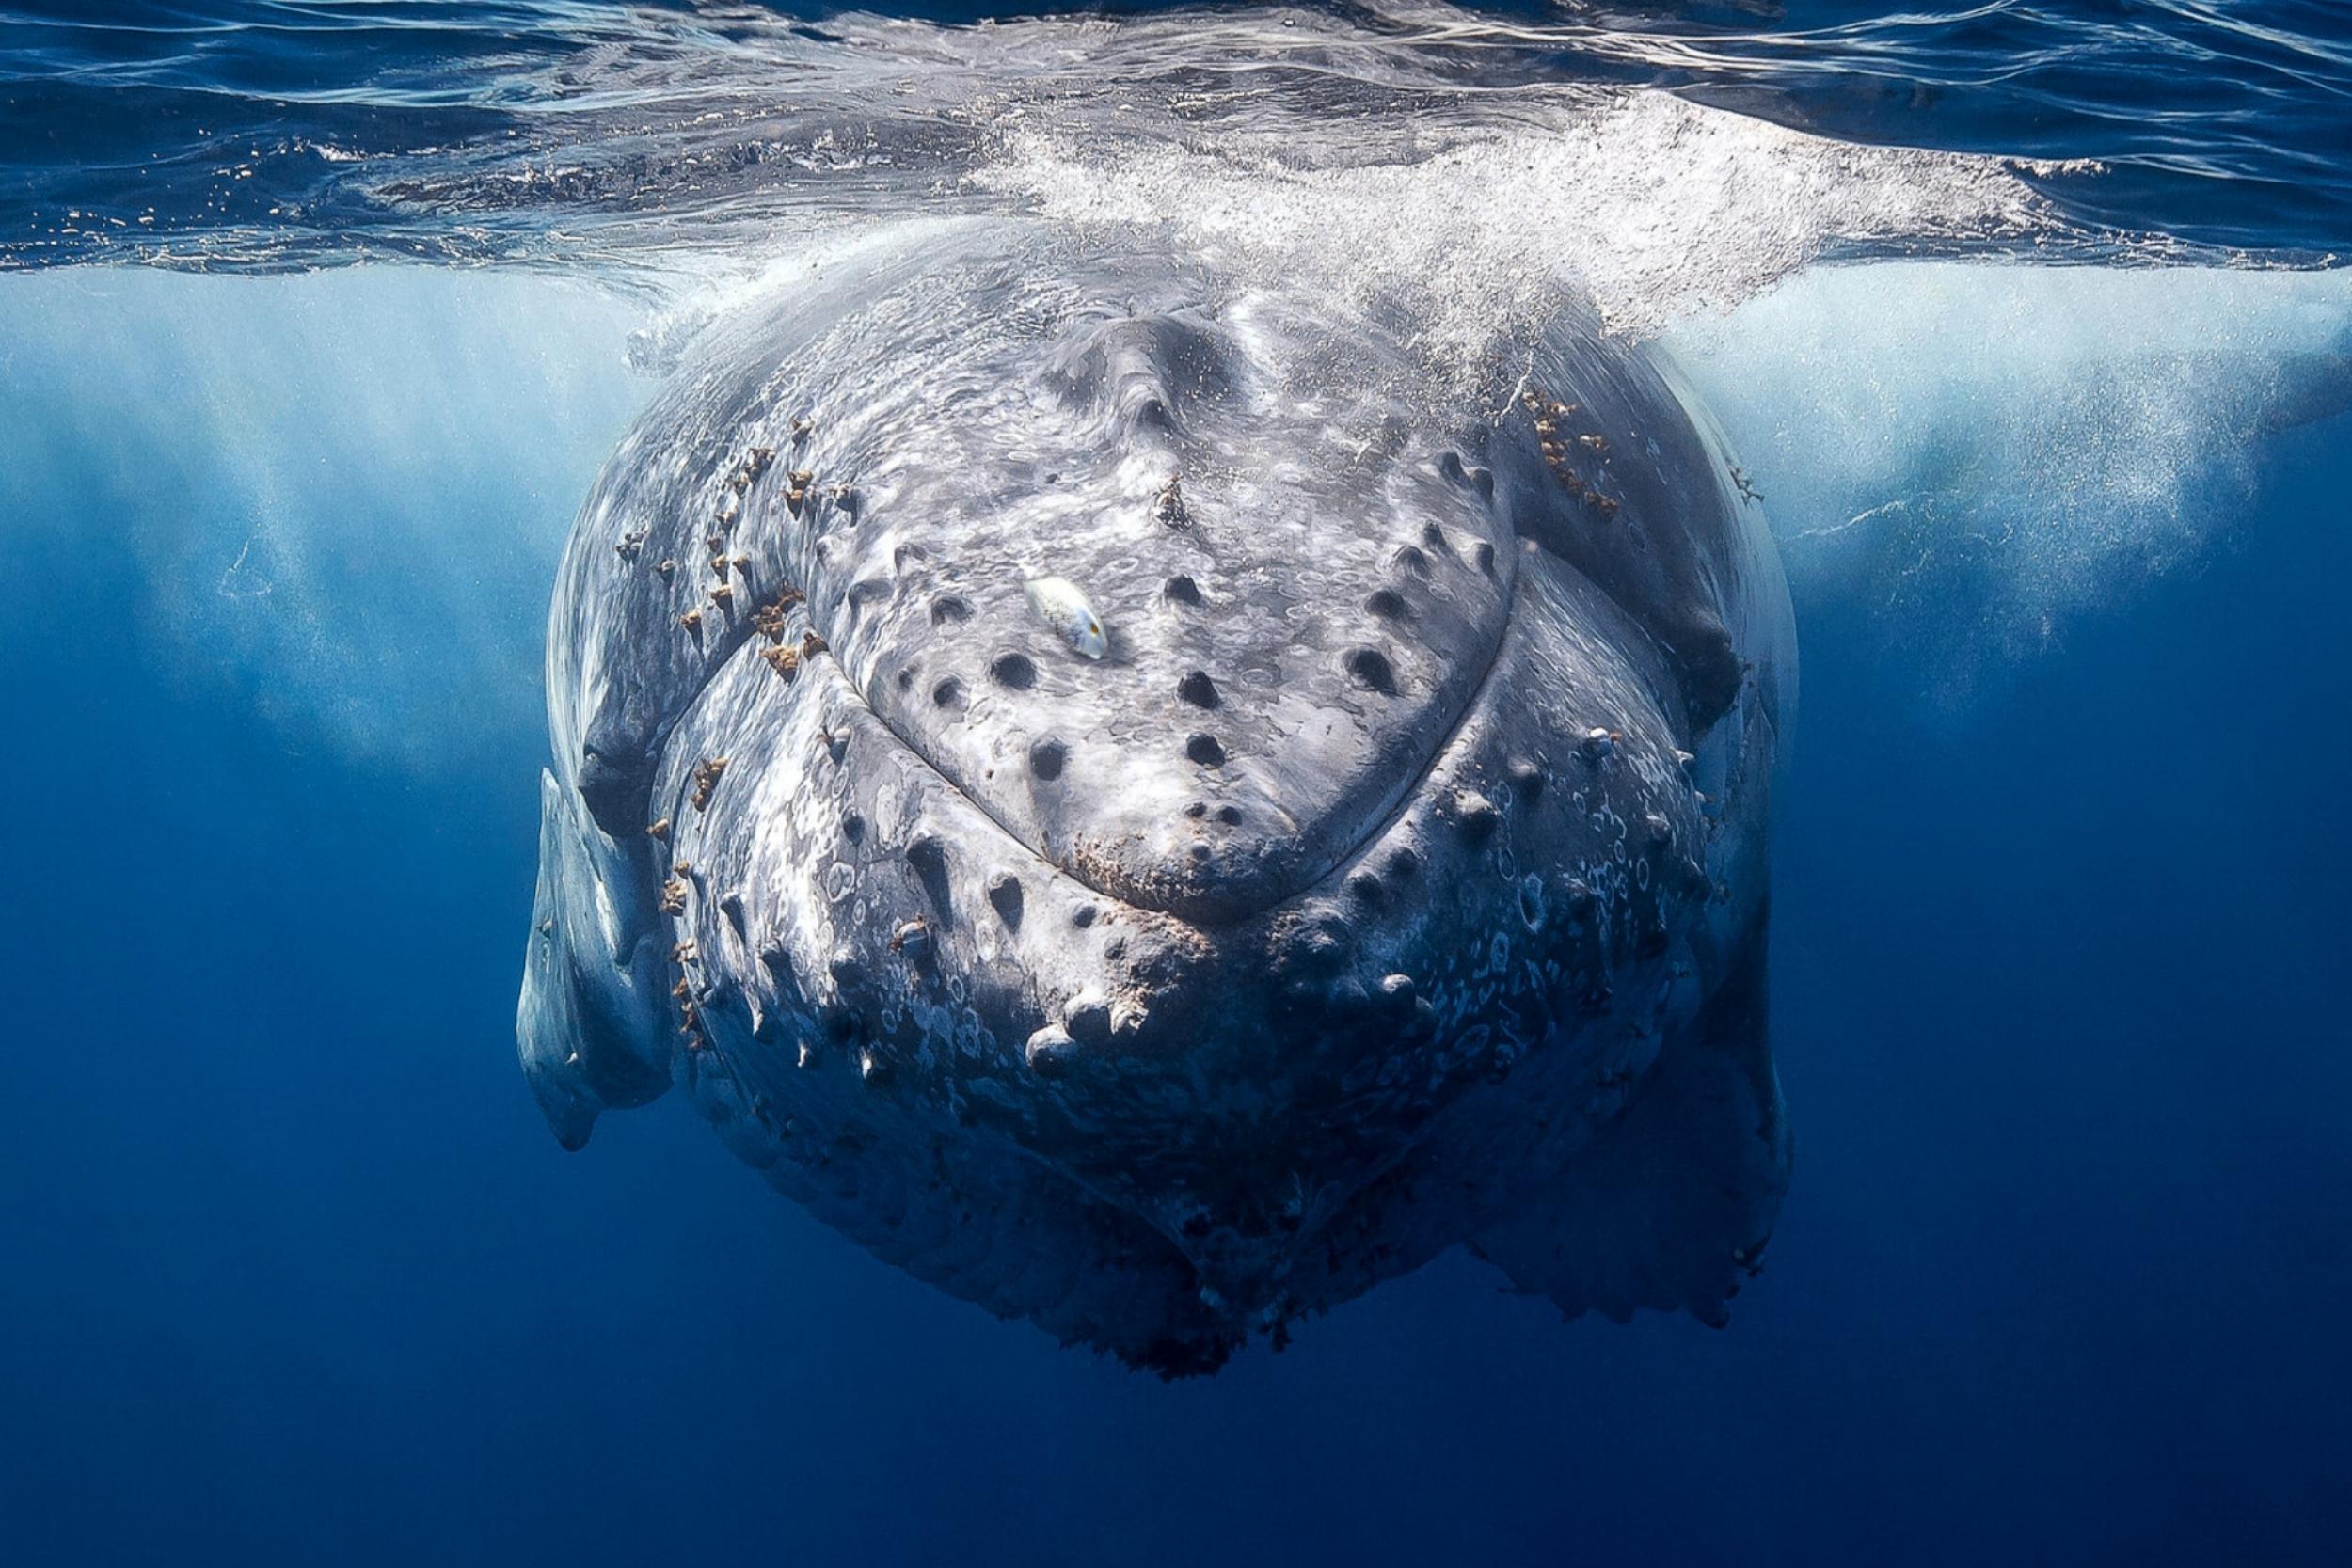 Whale_Photo1_draft_graded.jpg